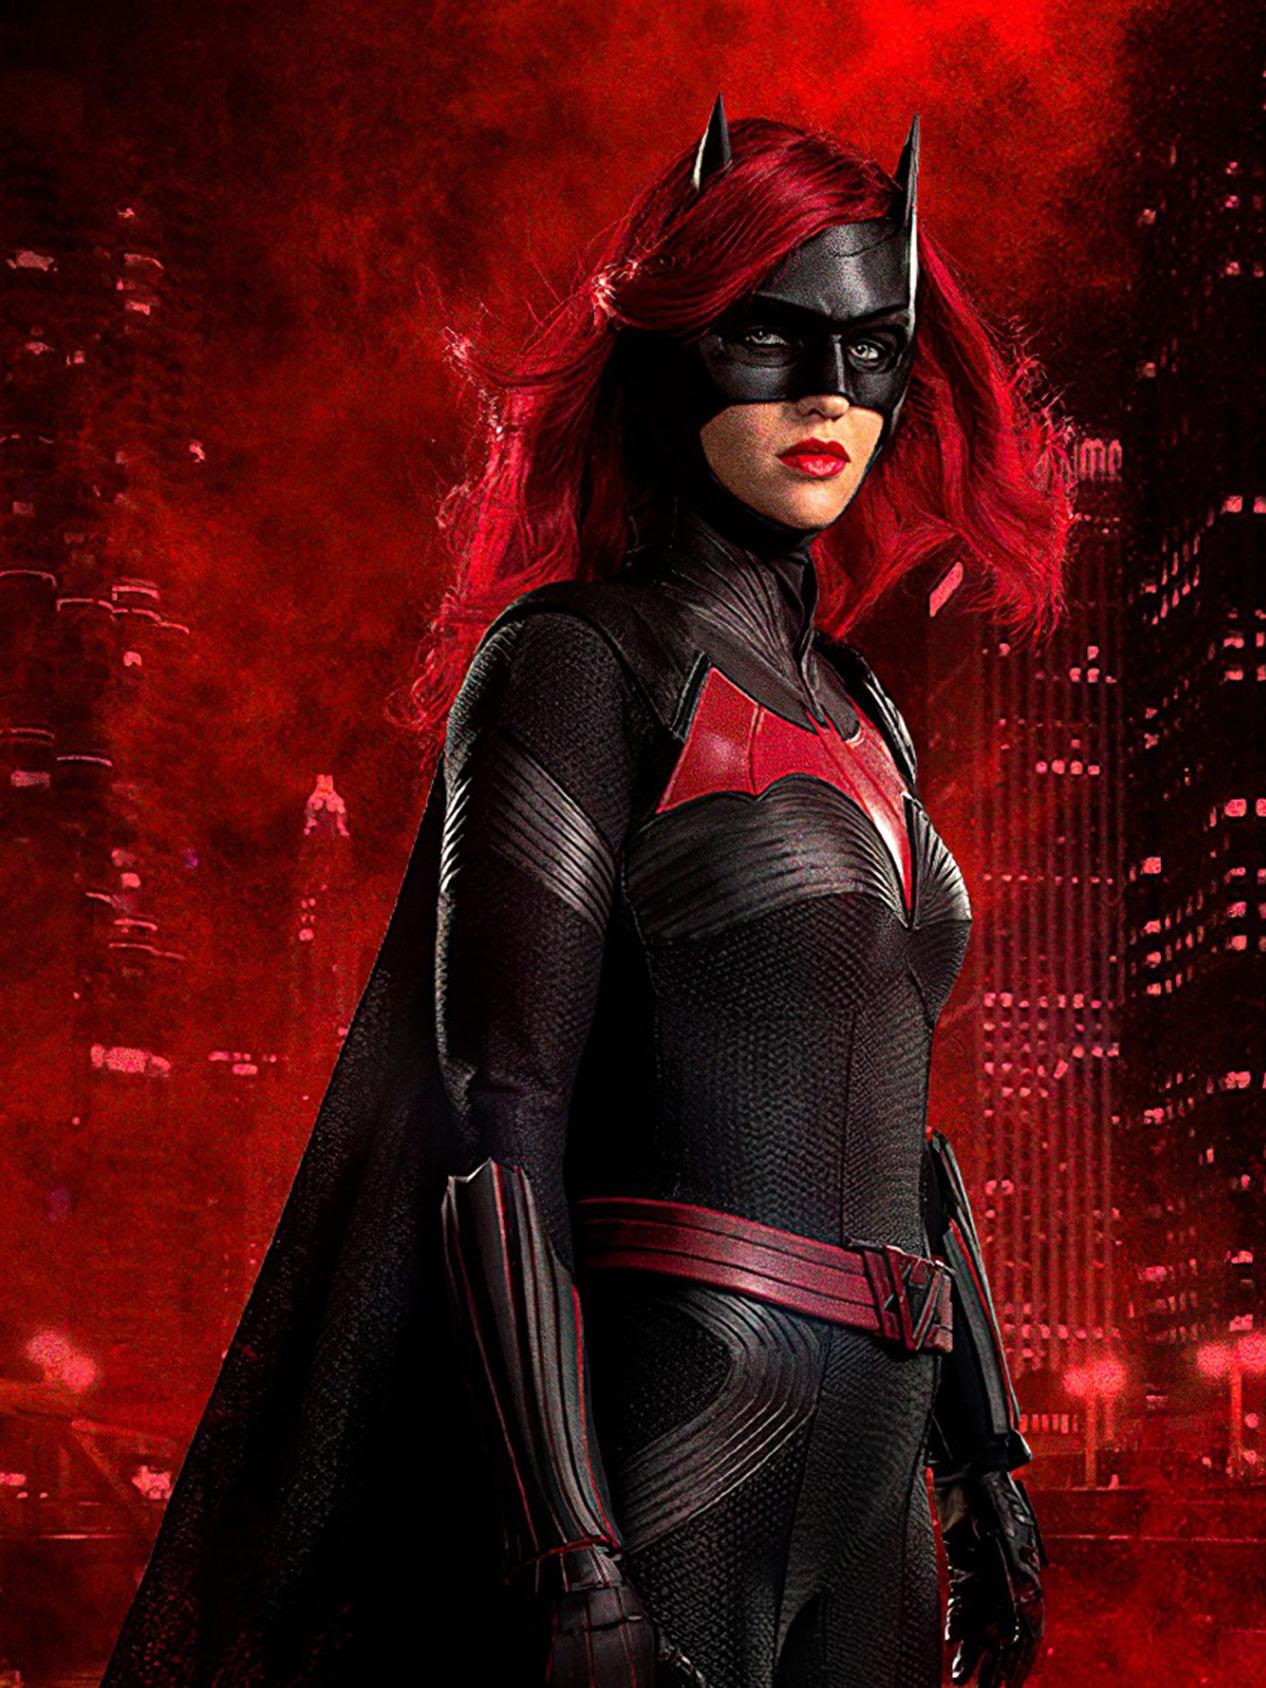 Should Kate Kane Return To Batwoman? - Den of Geek